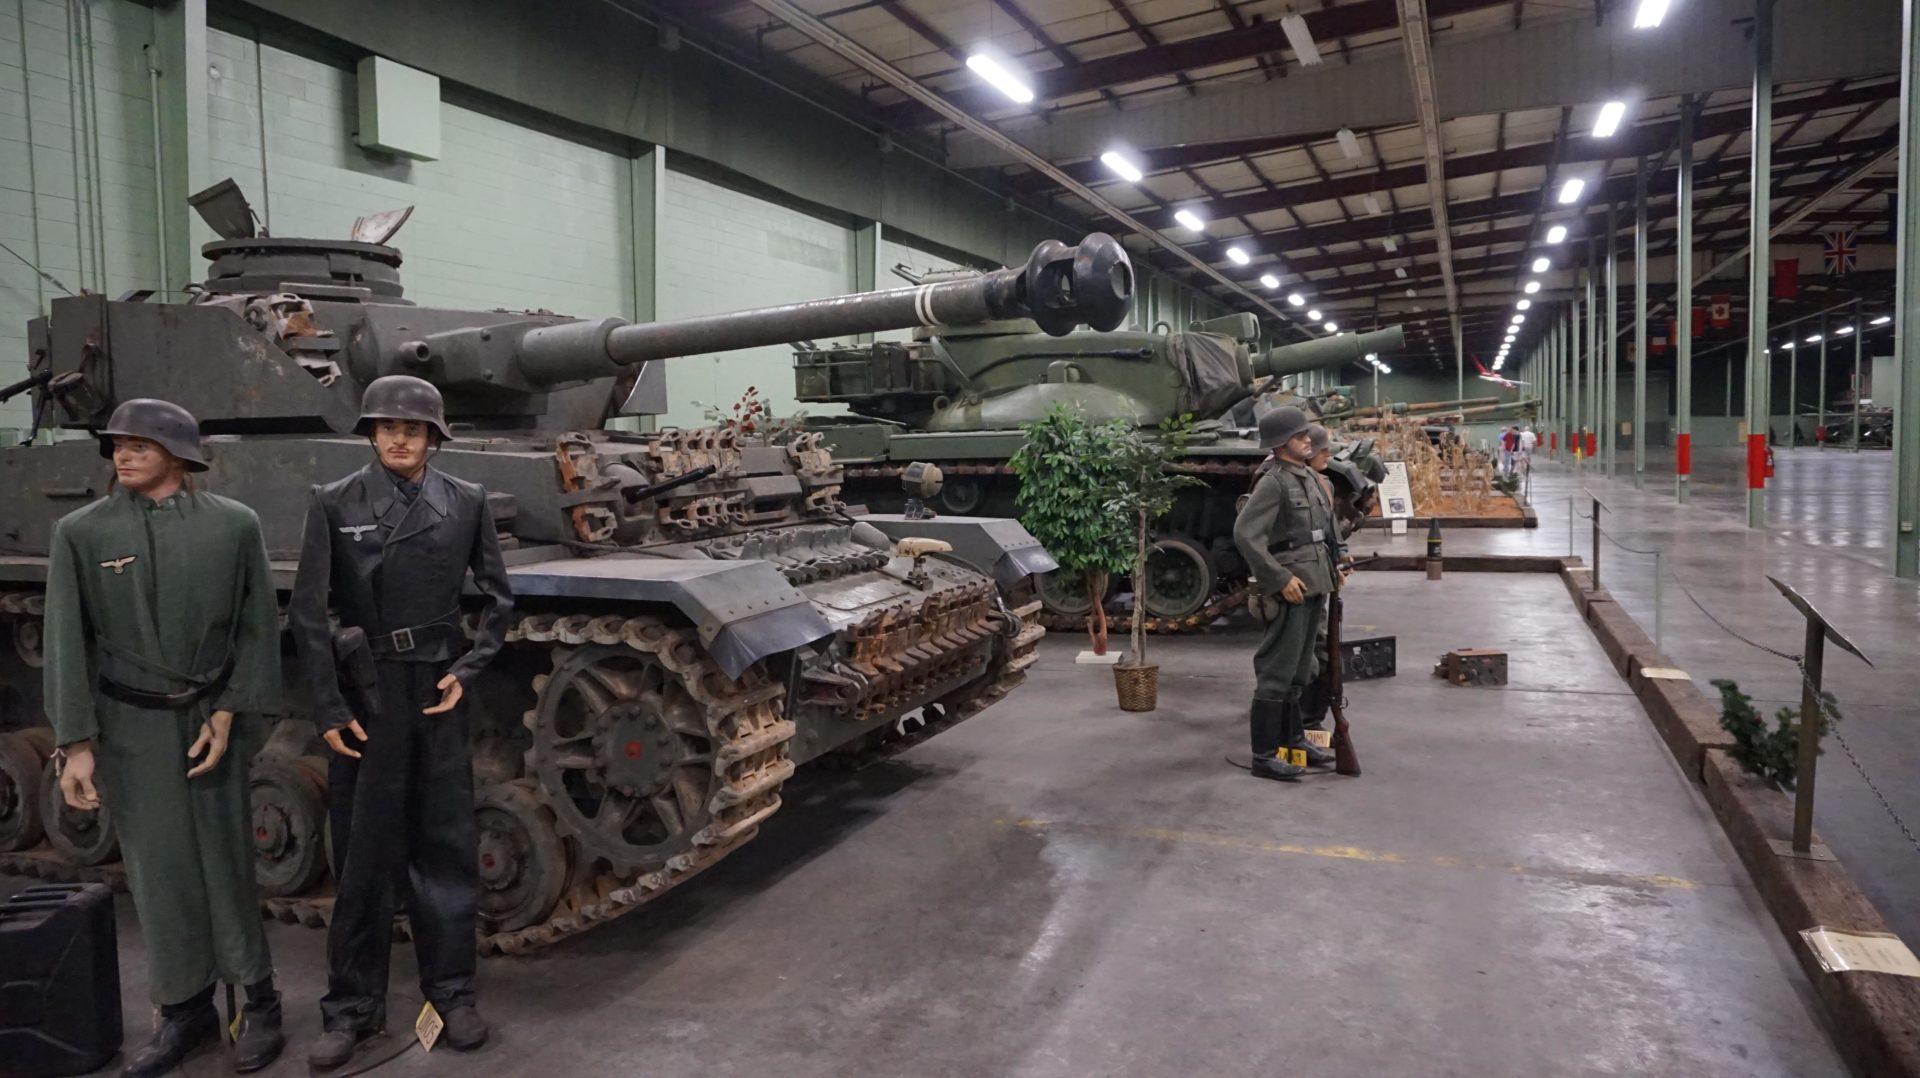 Tanks on display at the tank museum in Danville, Virginia